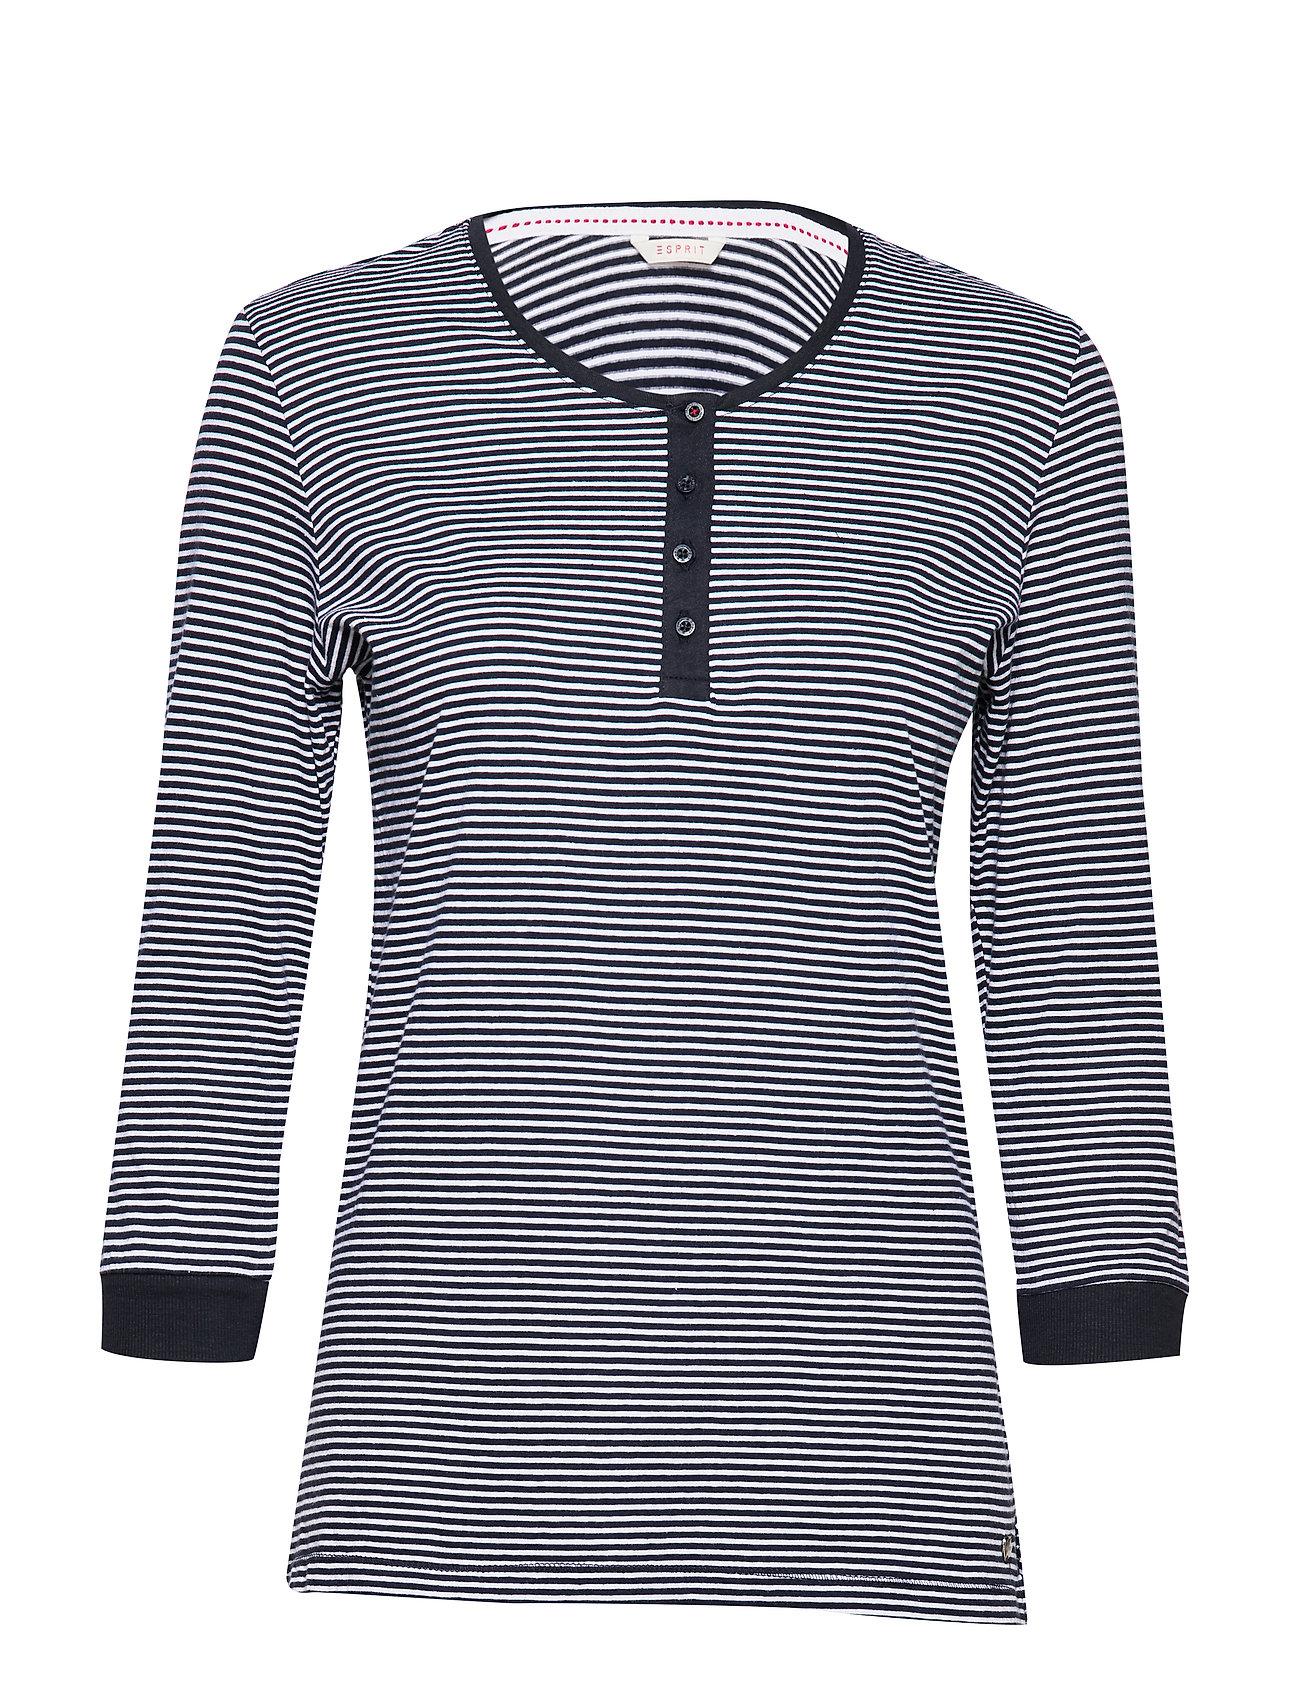 Image of Pyjamas Top Blå Esprit Bodywear Women (3269500683)